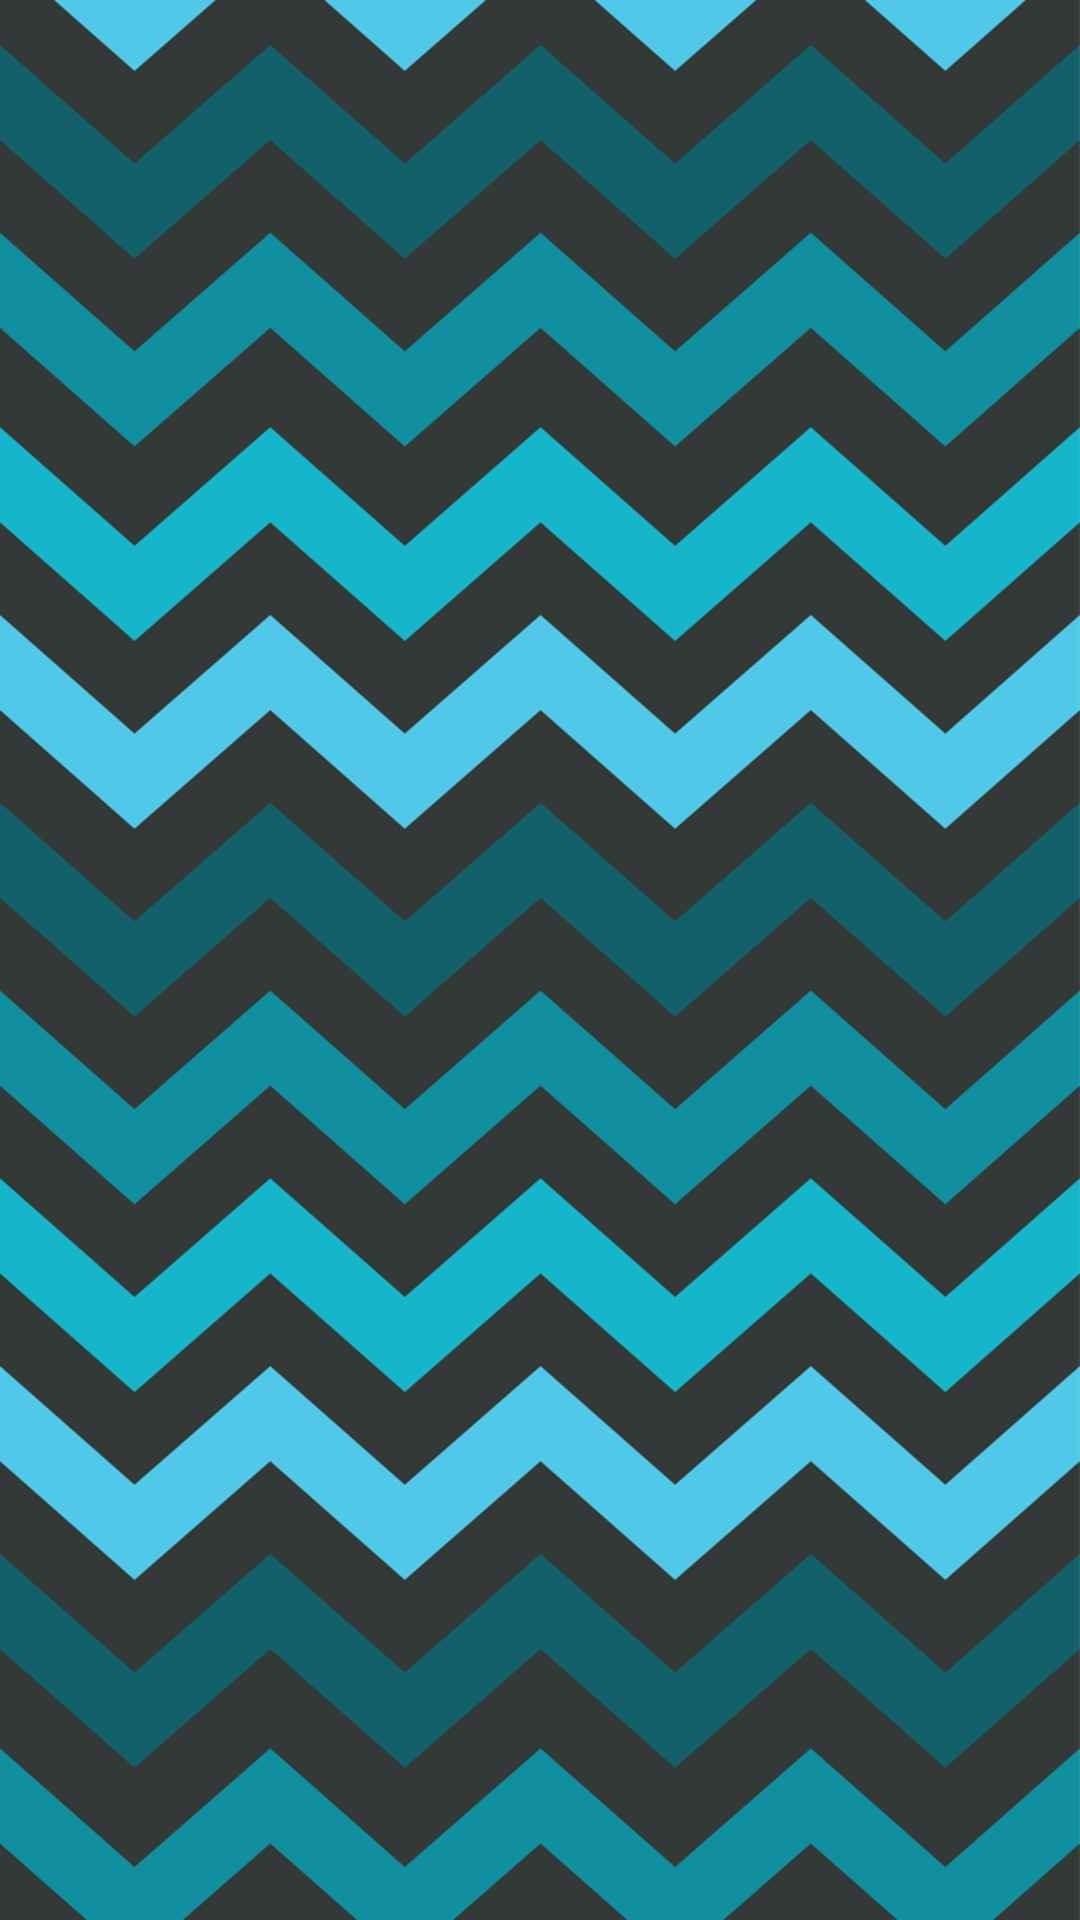 Chevron Dim Blue and Black iPhone 6 Plus Wallpaper – Zigzag Pattern,  #iPhone #